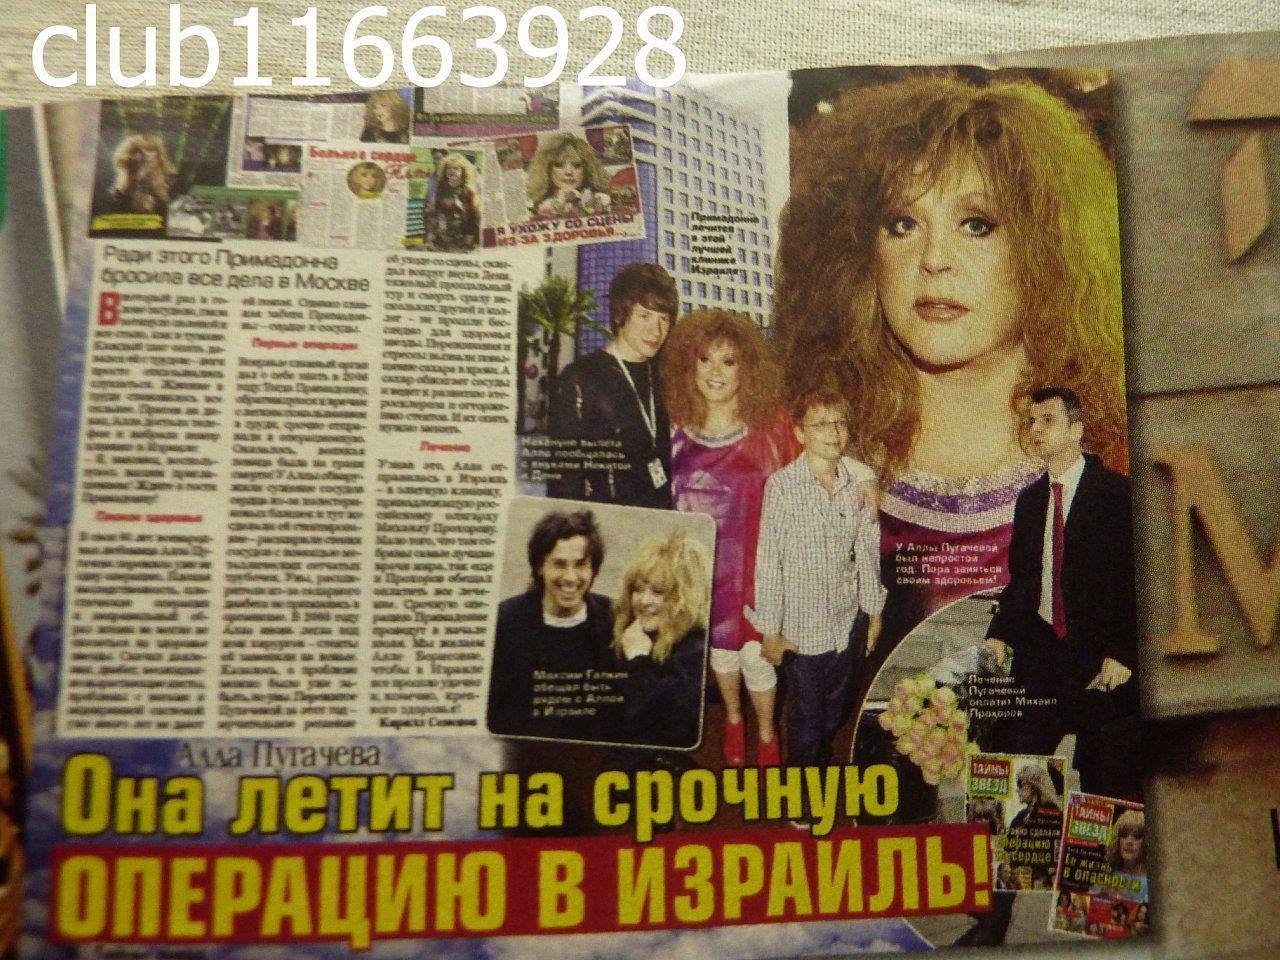 http://s5.uploads.ru/NhjGg.jpg